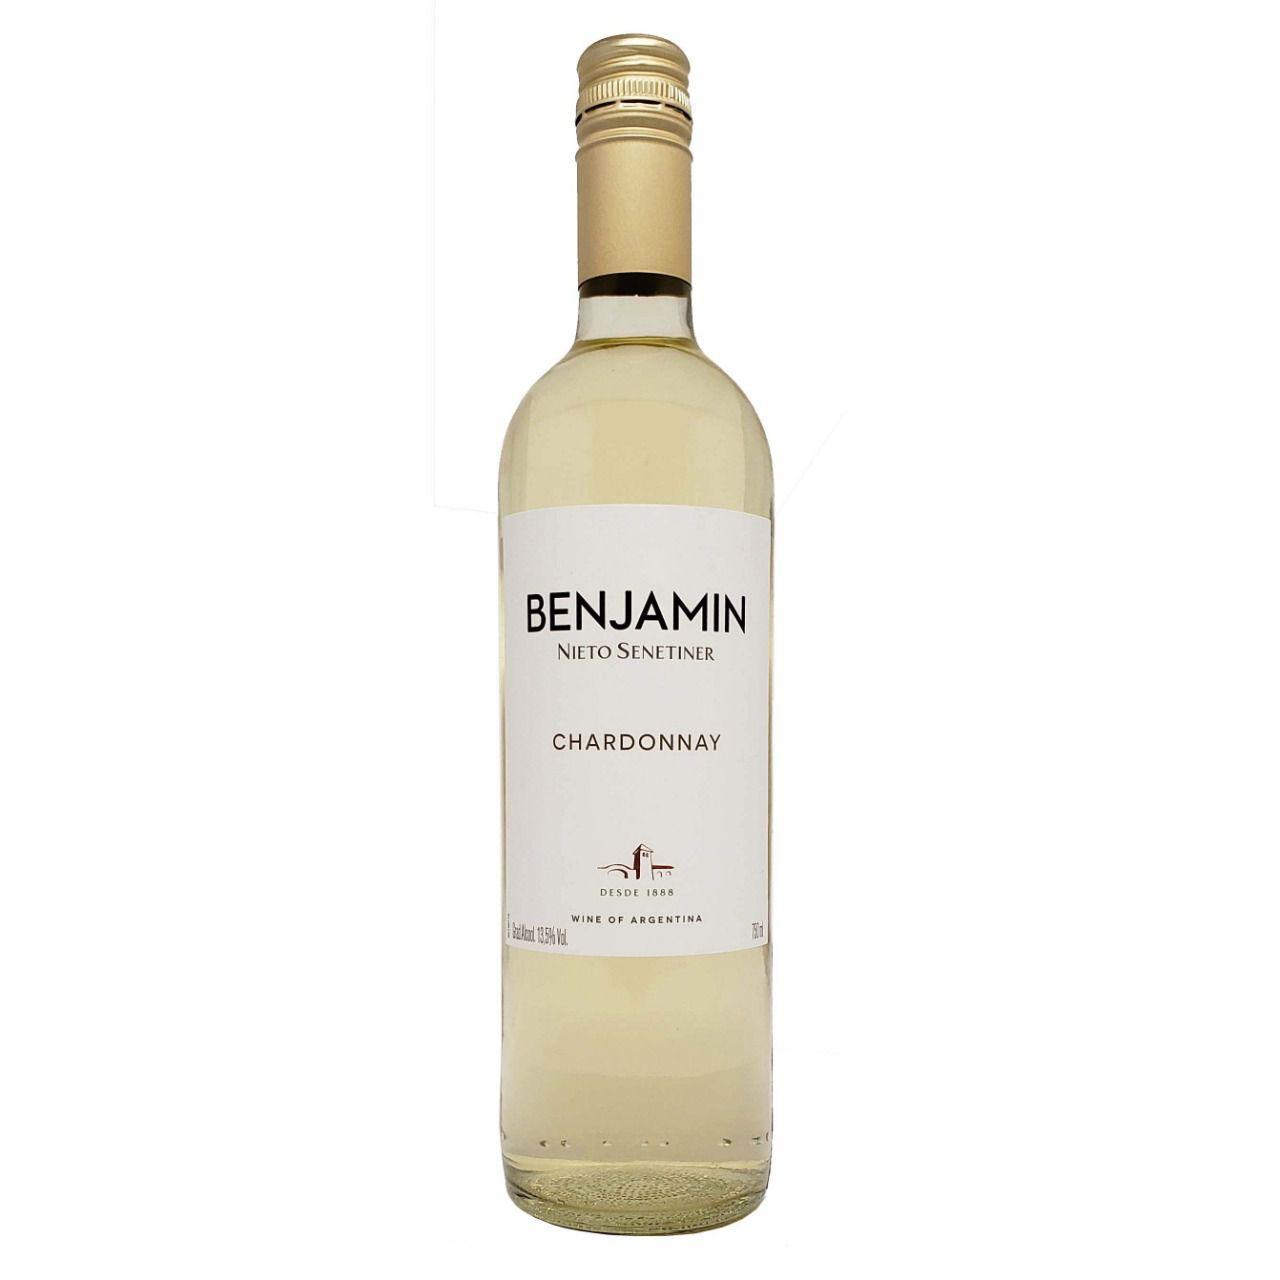 Vinho Branco Benjamin Nieto Senetiner Chardonnay - 750ml -